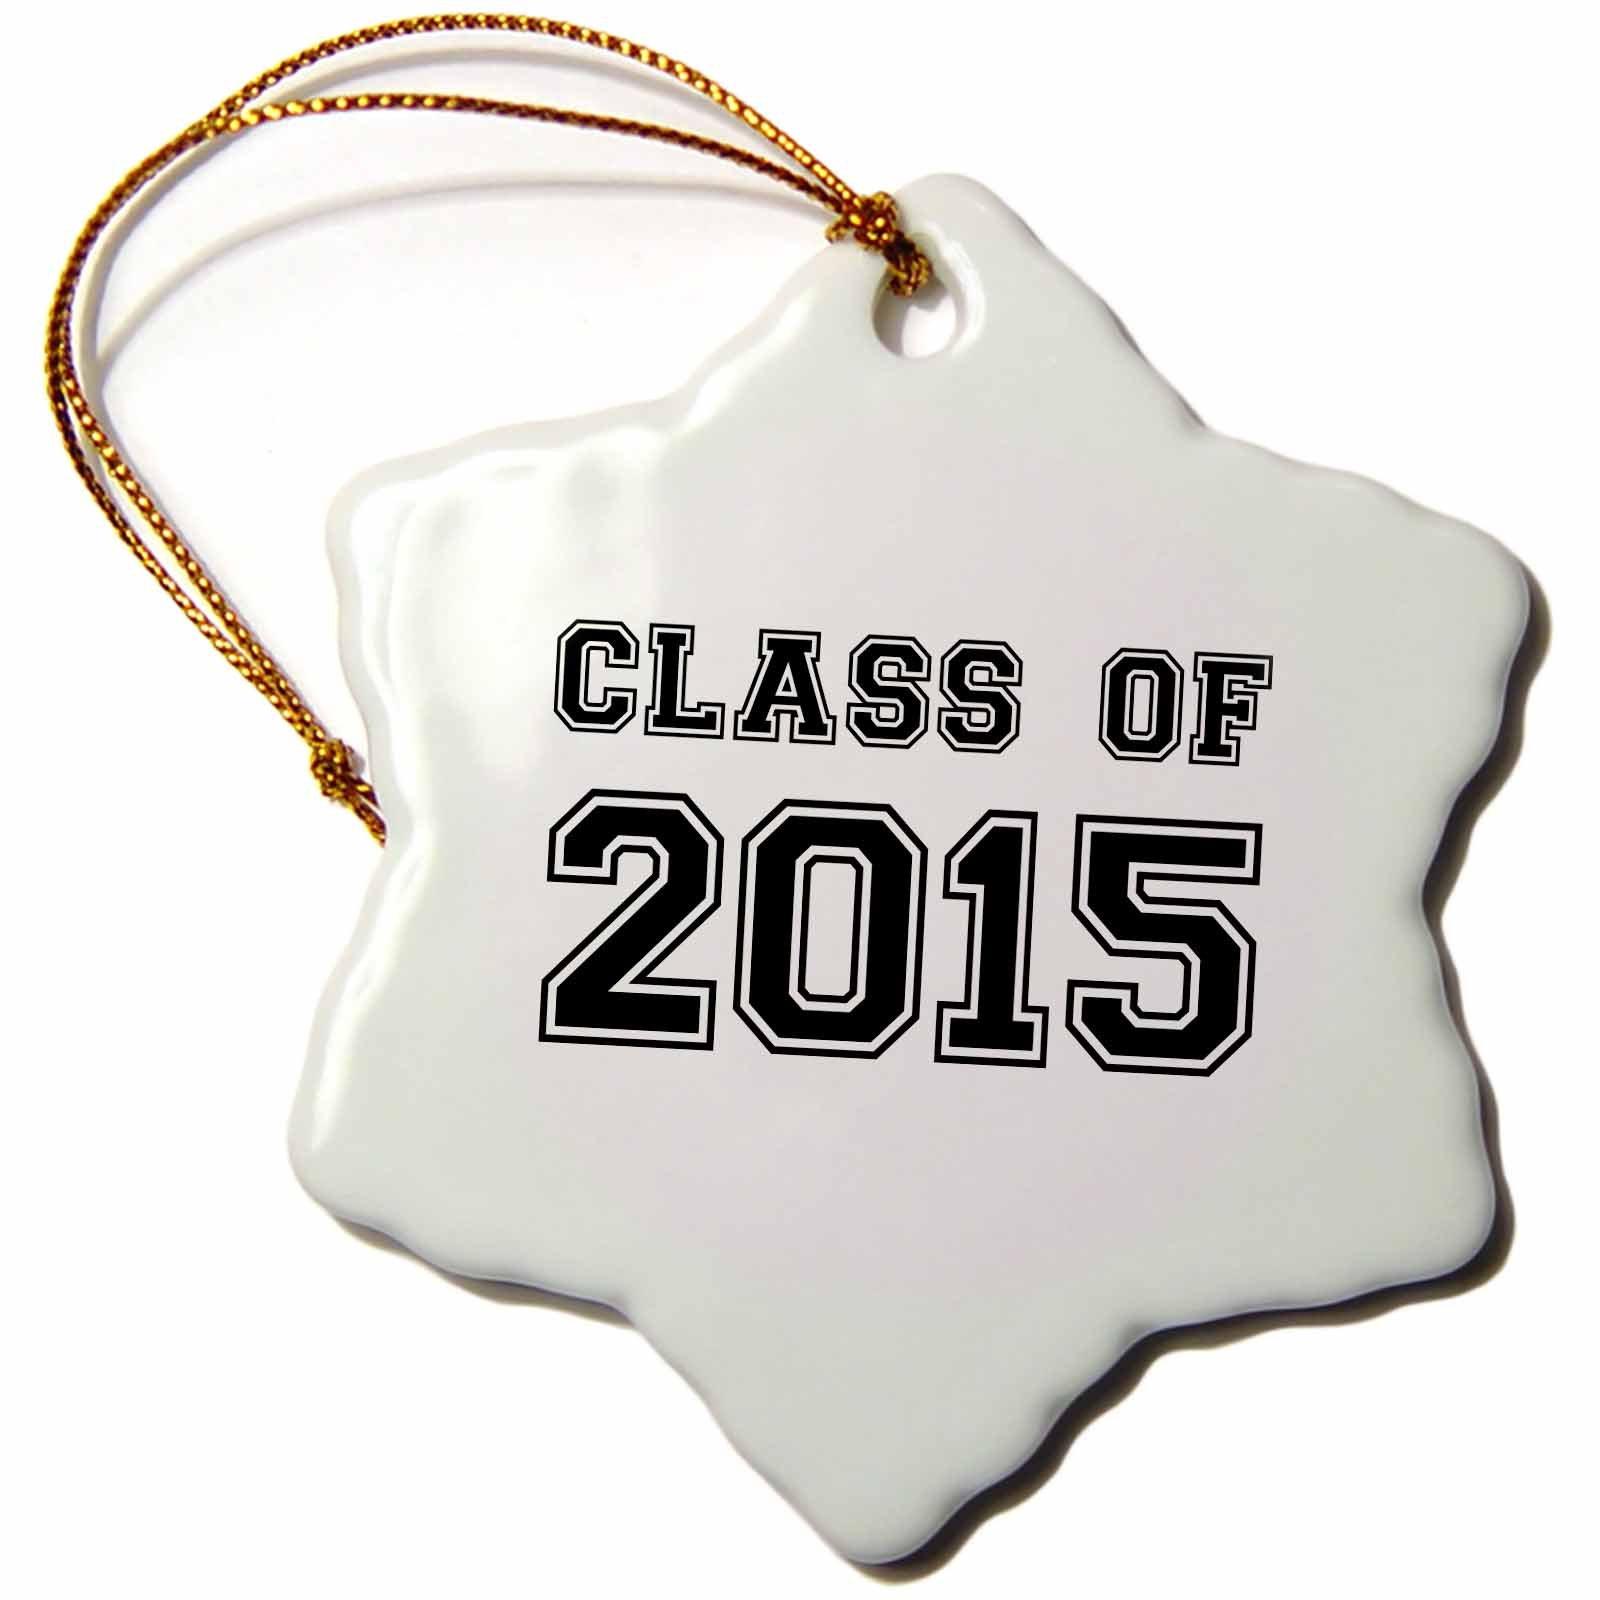 3dRose InspirationzStore Typography - Class of 2015 - Graduation gift - graduate graduating high school university or college grad black - 3 inch Snowflake Porcelain Ornament (orn_162666_1)